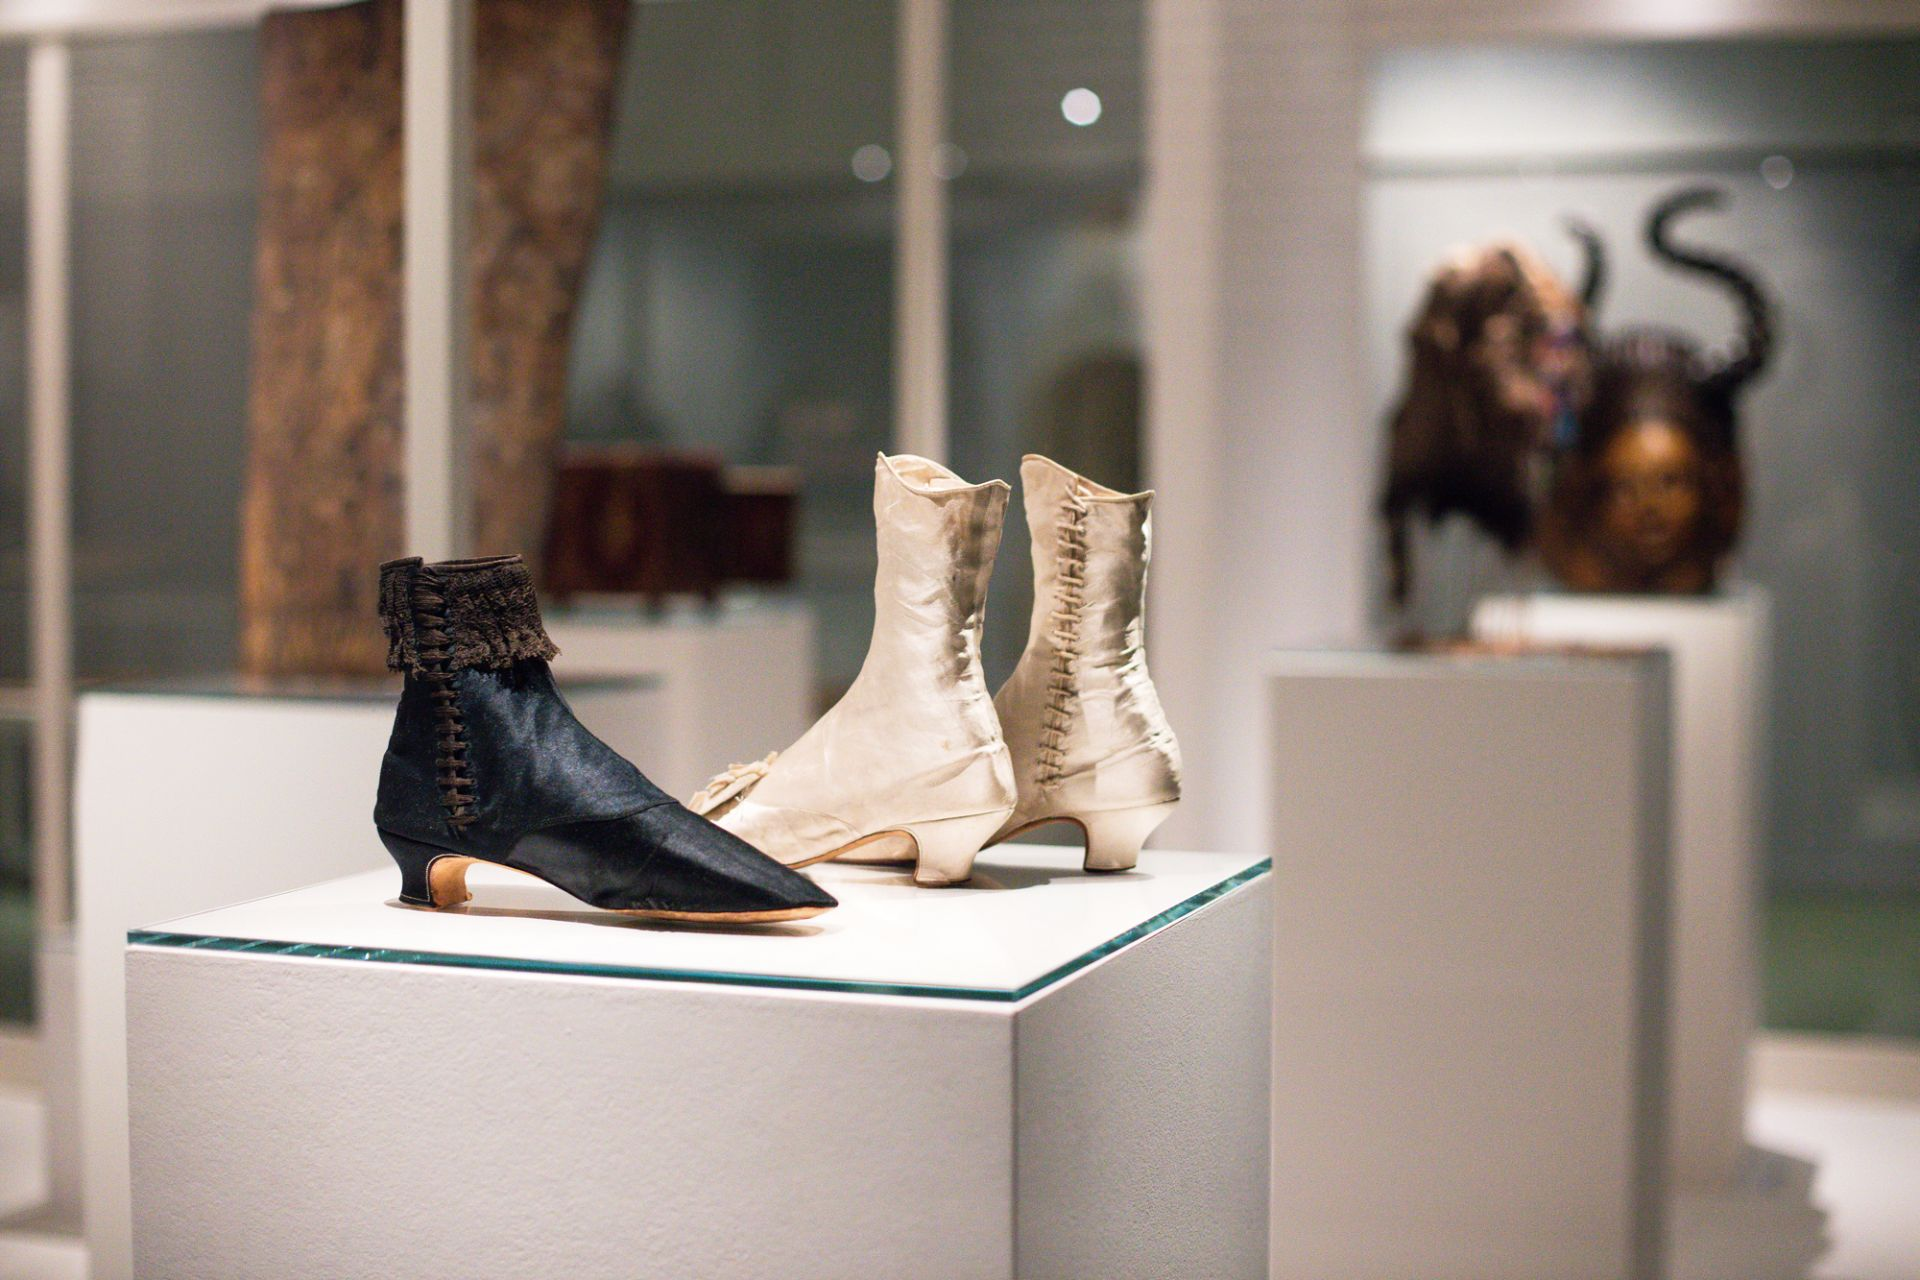 Empress Elisabeth's boots, Austria, 1865 and Princess Pauline von Metternich's bridal boots, France, approx. 1860